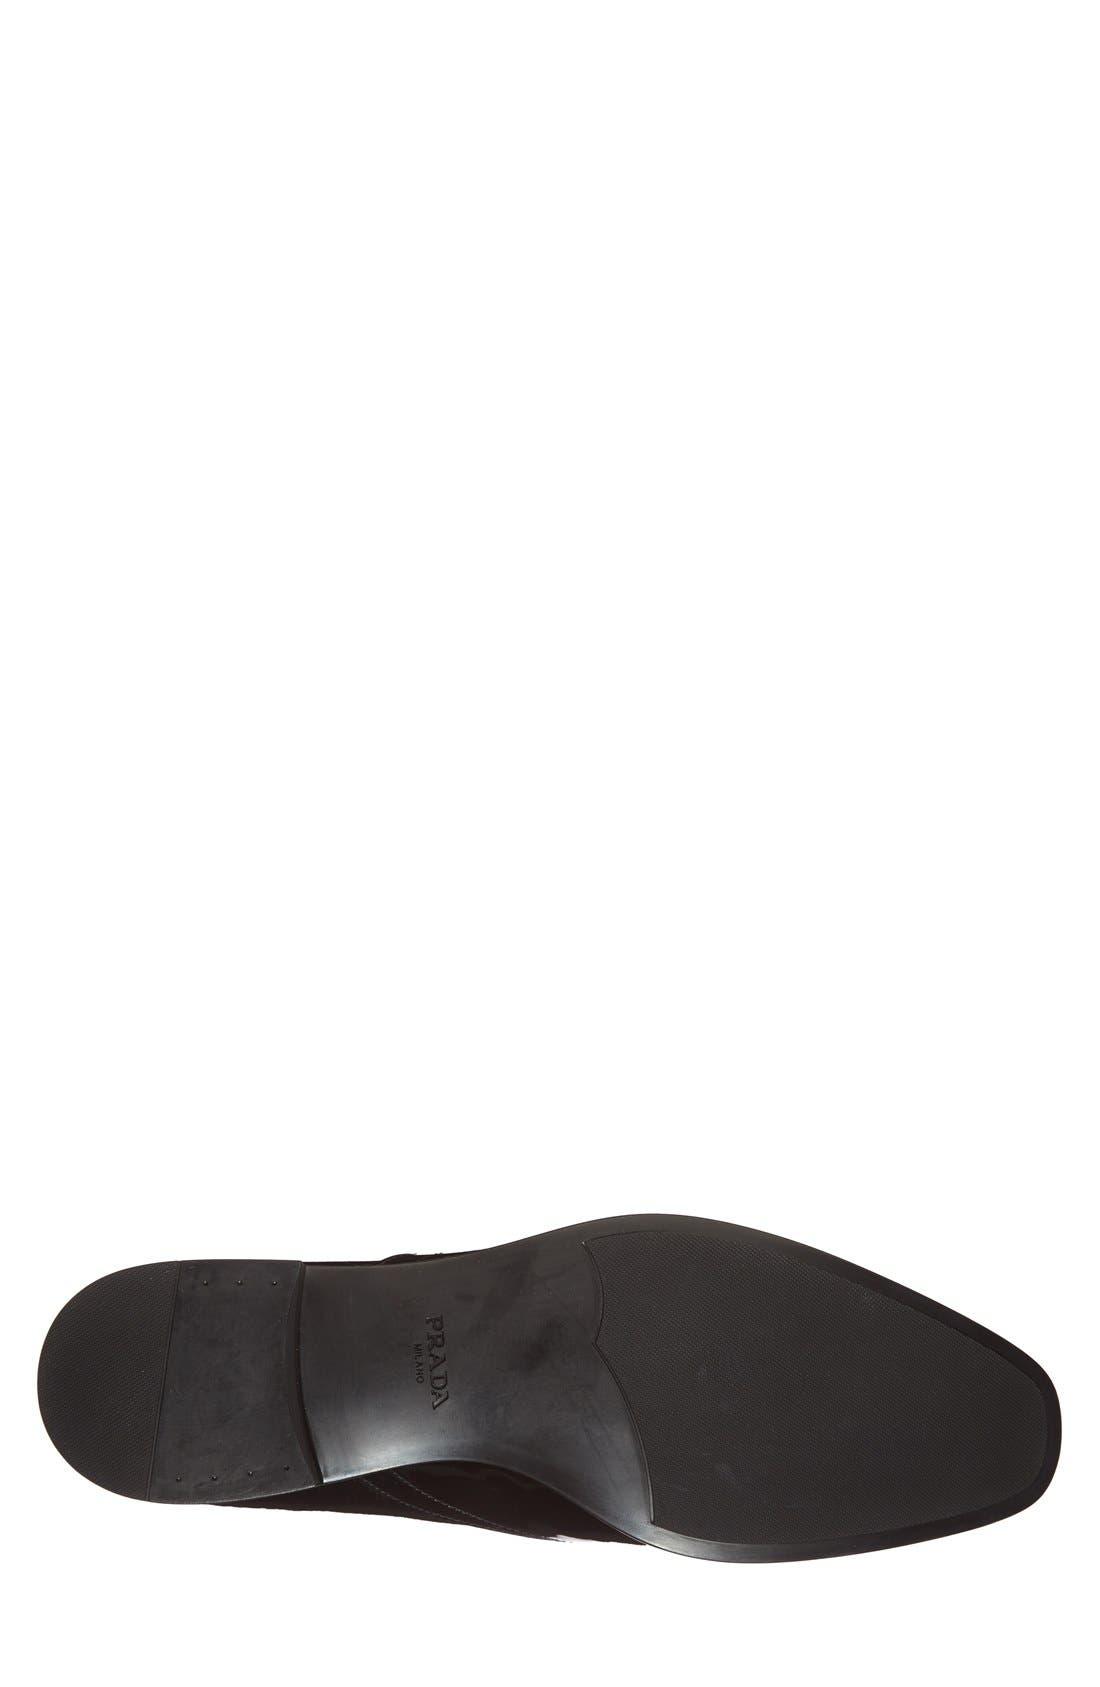 Patent Venetian Loafer,                             Alternate thumbnail 4, color,                             001